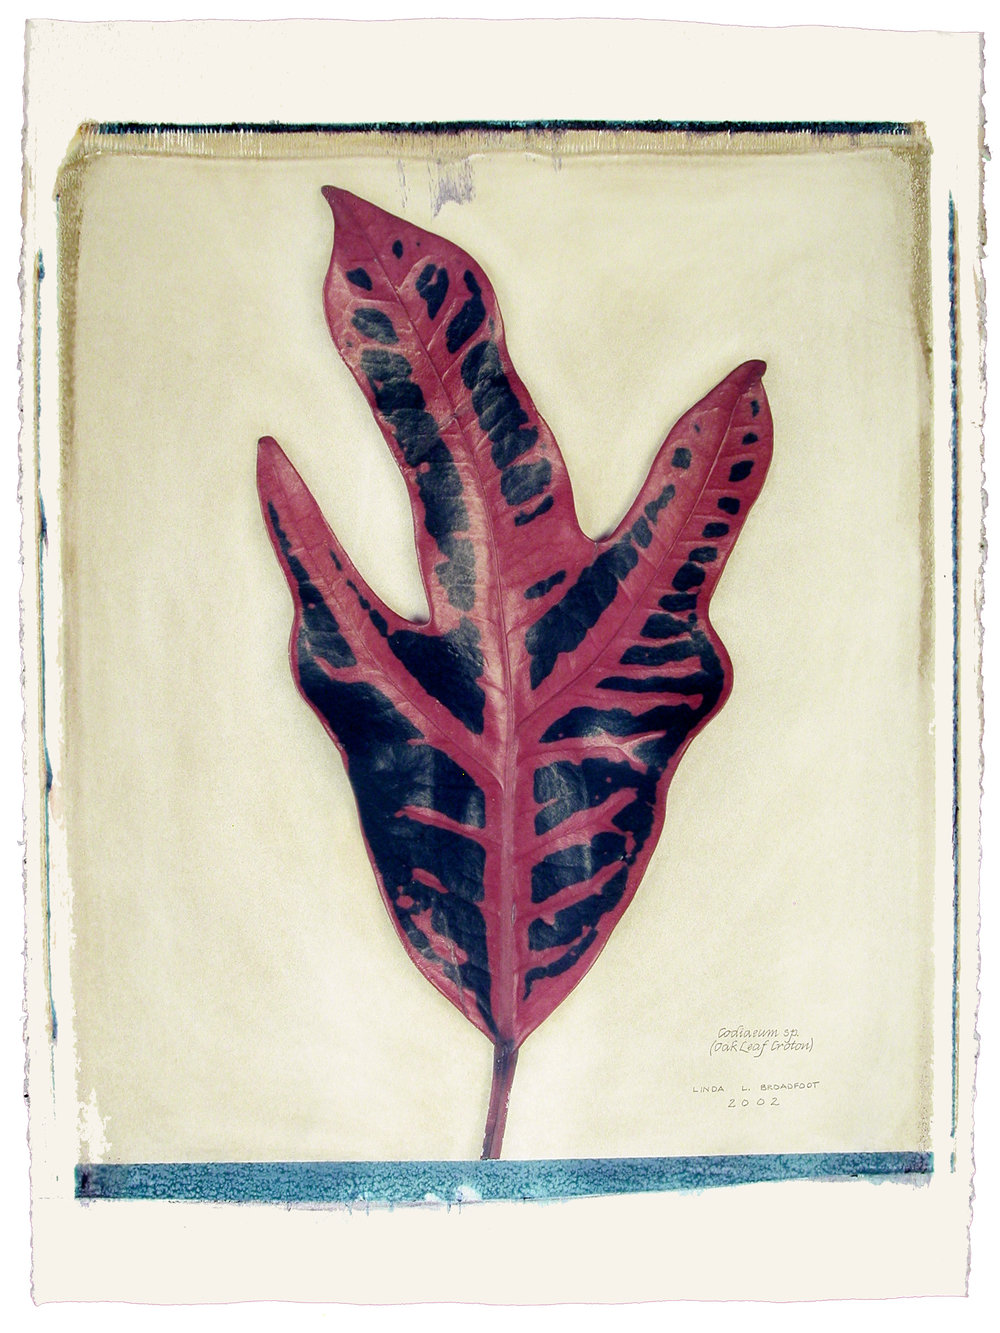 Codiaeum sp.  (Oak Leaf Croton), 2002